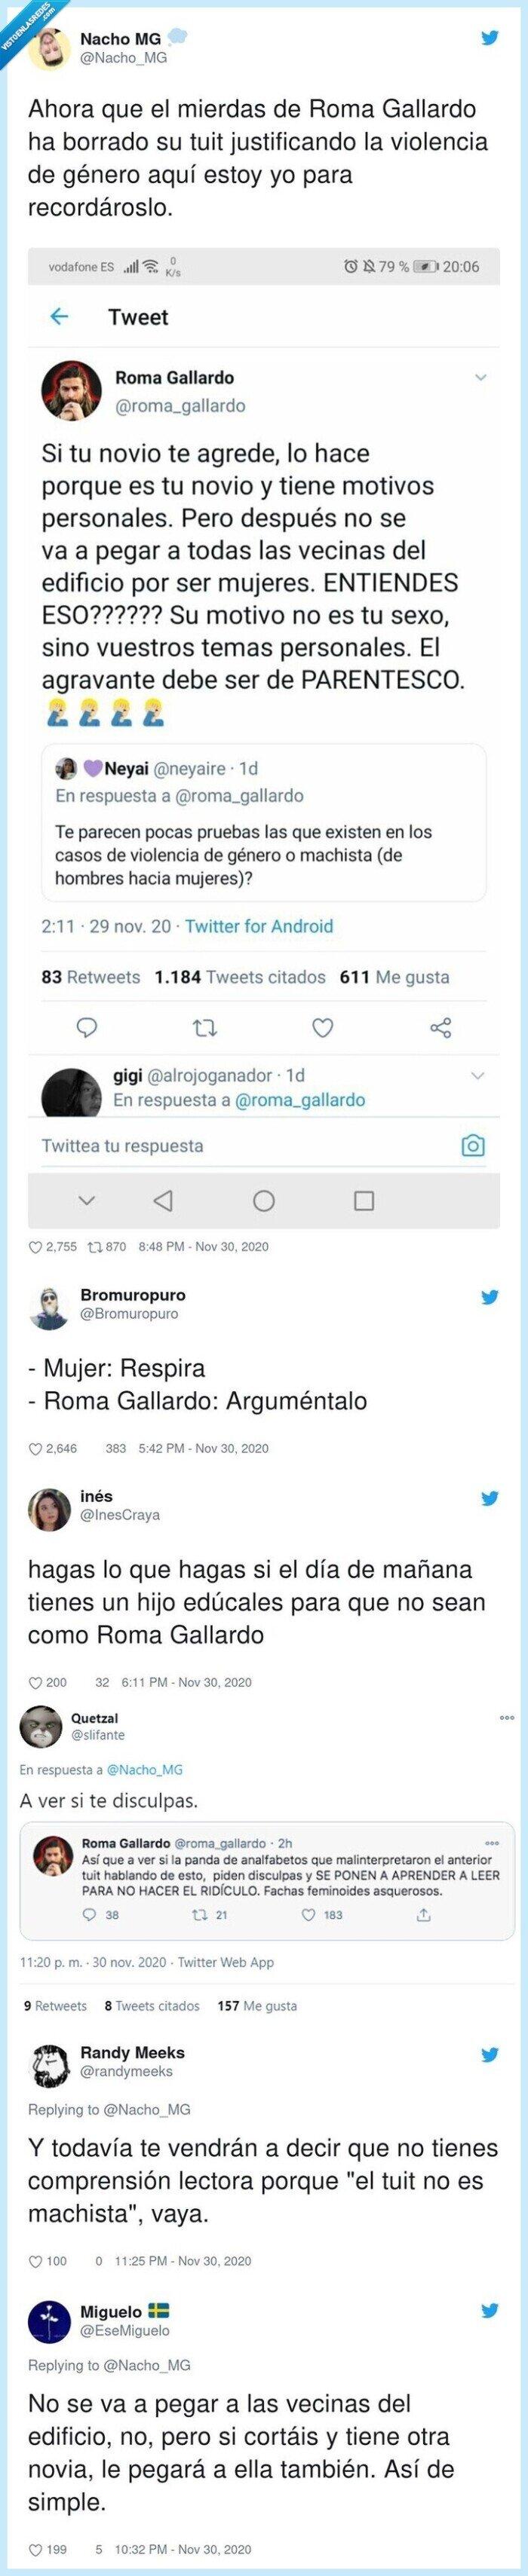 gallardo,género,roma,tweet,violencia,youtuber